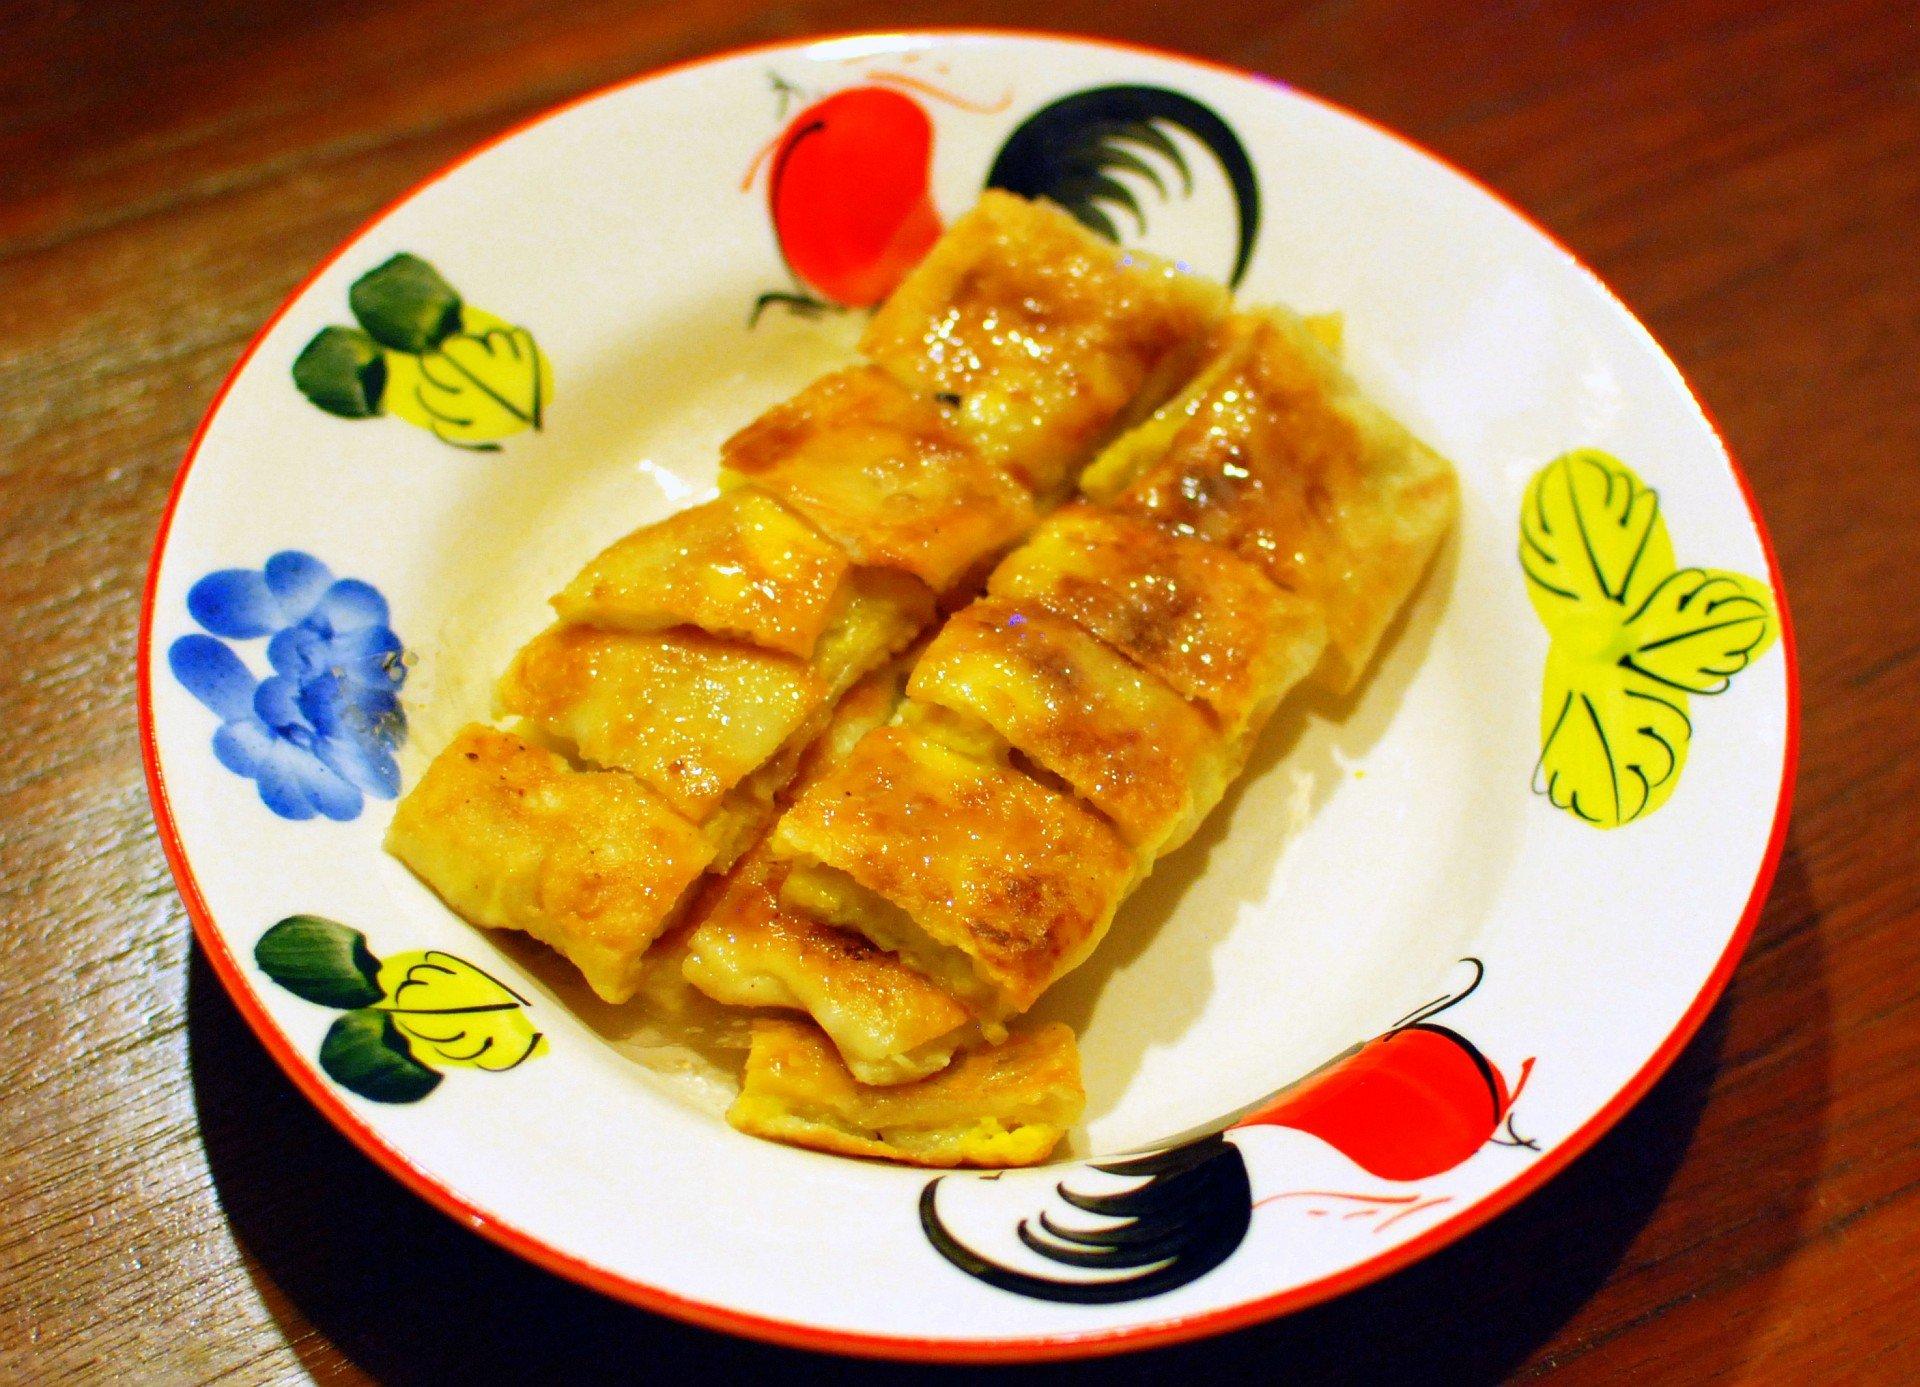 Roti_kluai_khai_chiang_mai_04